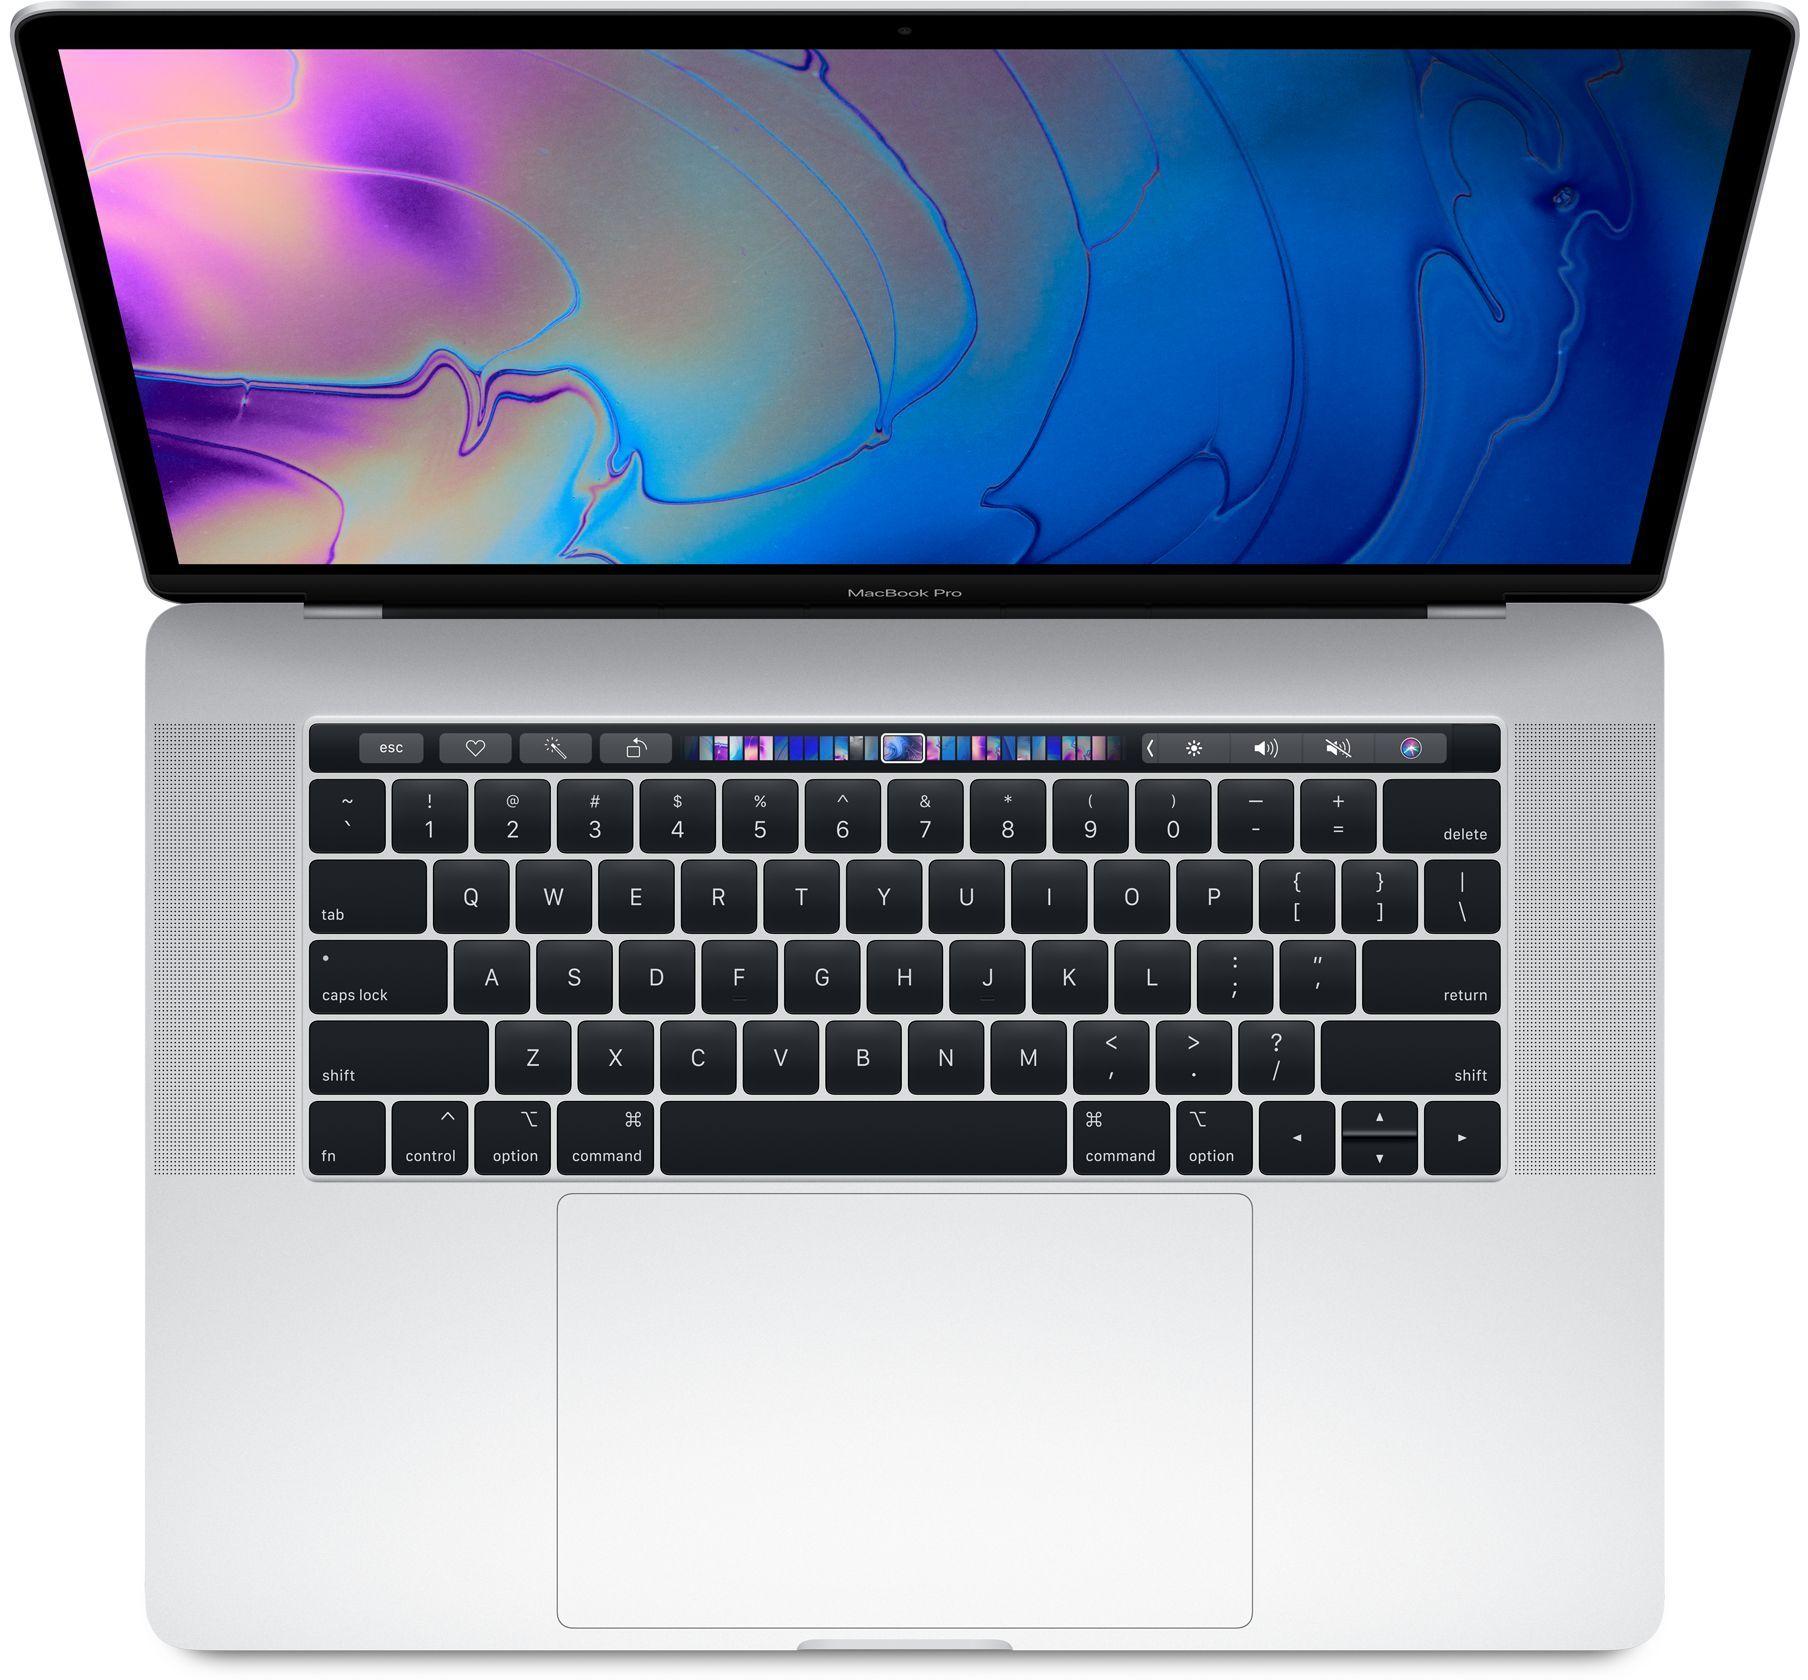 Buy Macbook Pro Buy Macbook Macbook Pro 15 Inch Macbook Pro